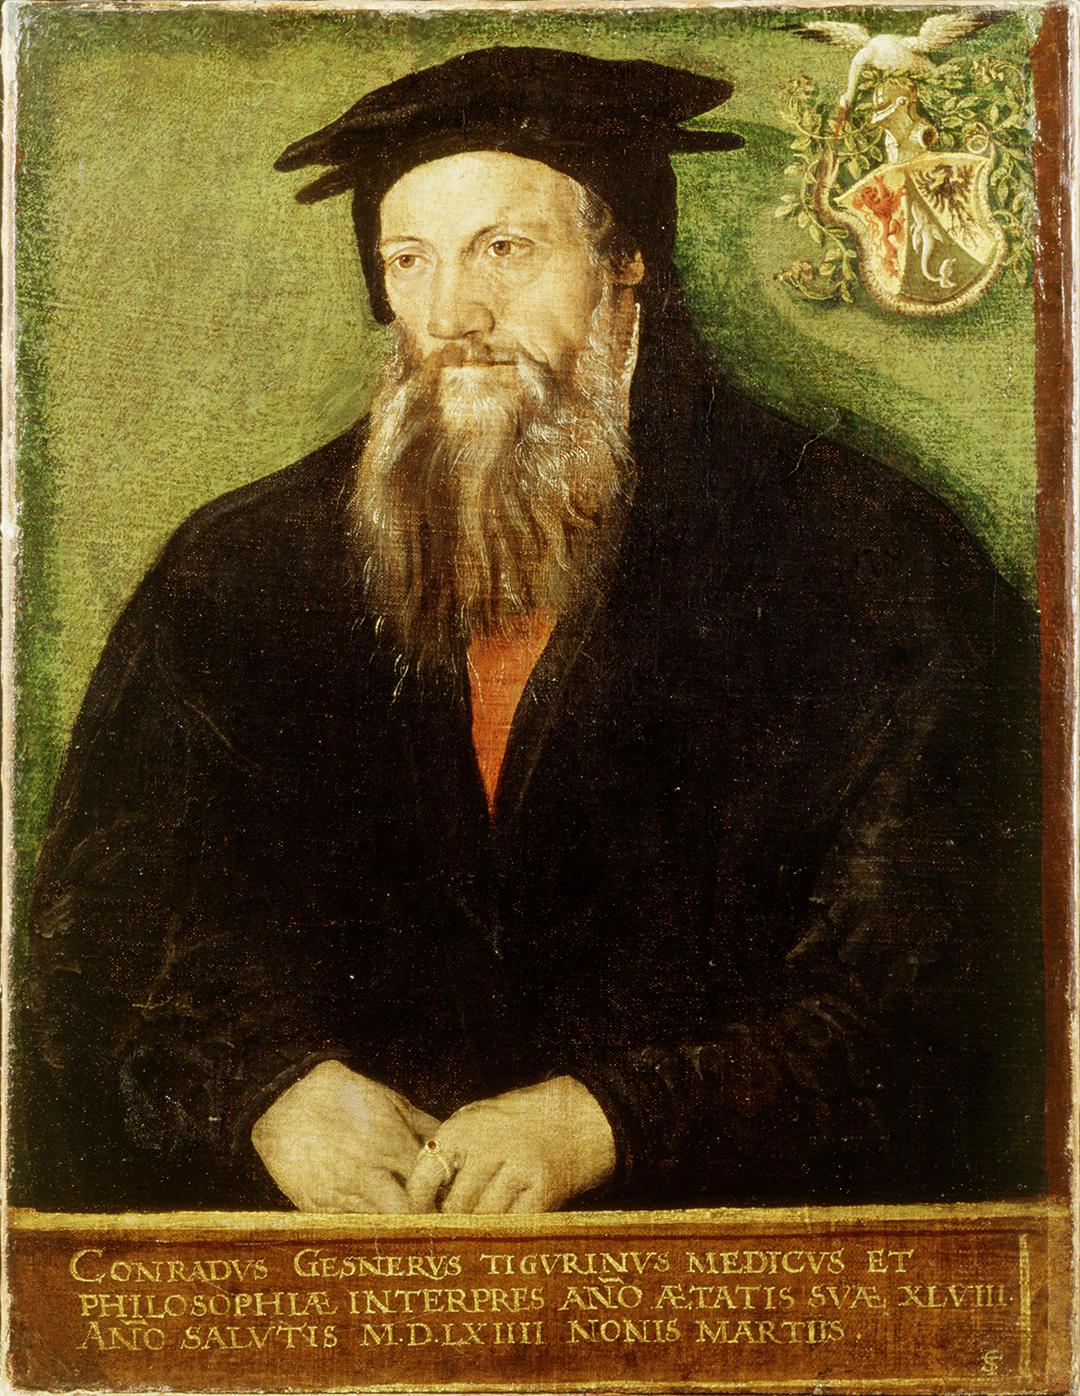 Tobias Stimmer, Bildnis Conrad Gessner, 1564.